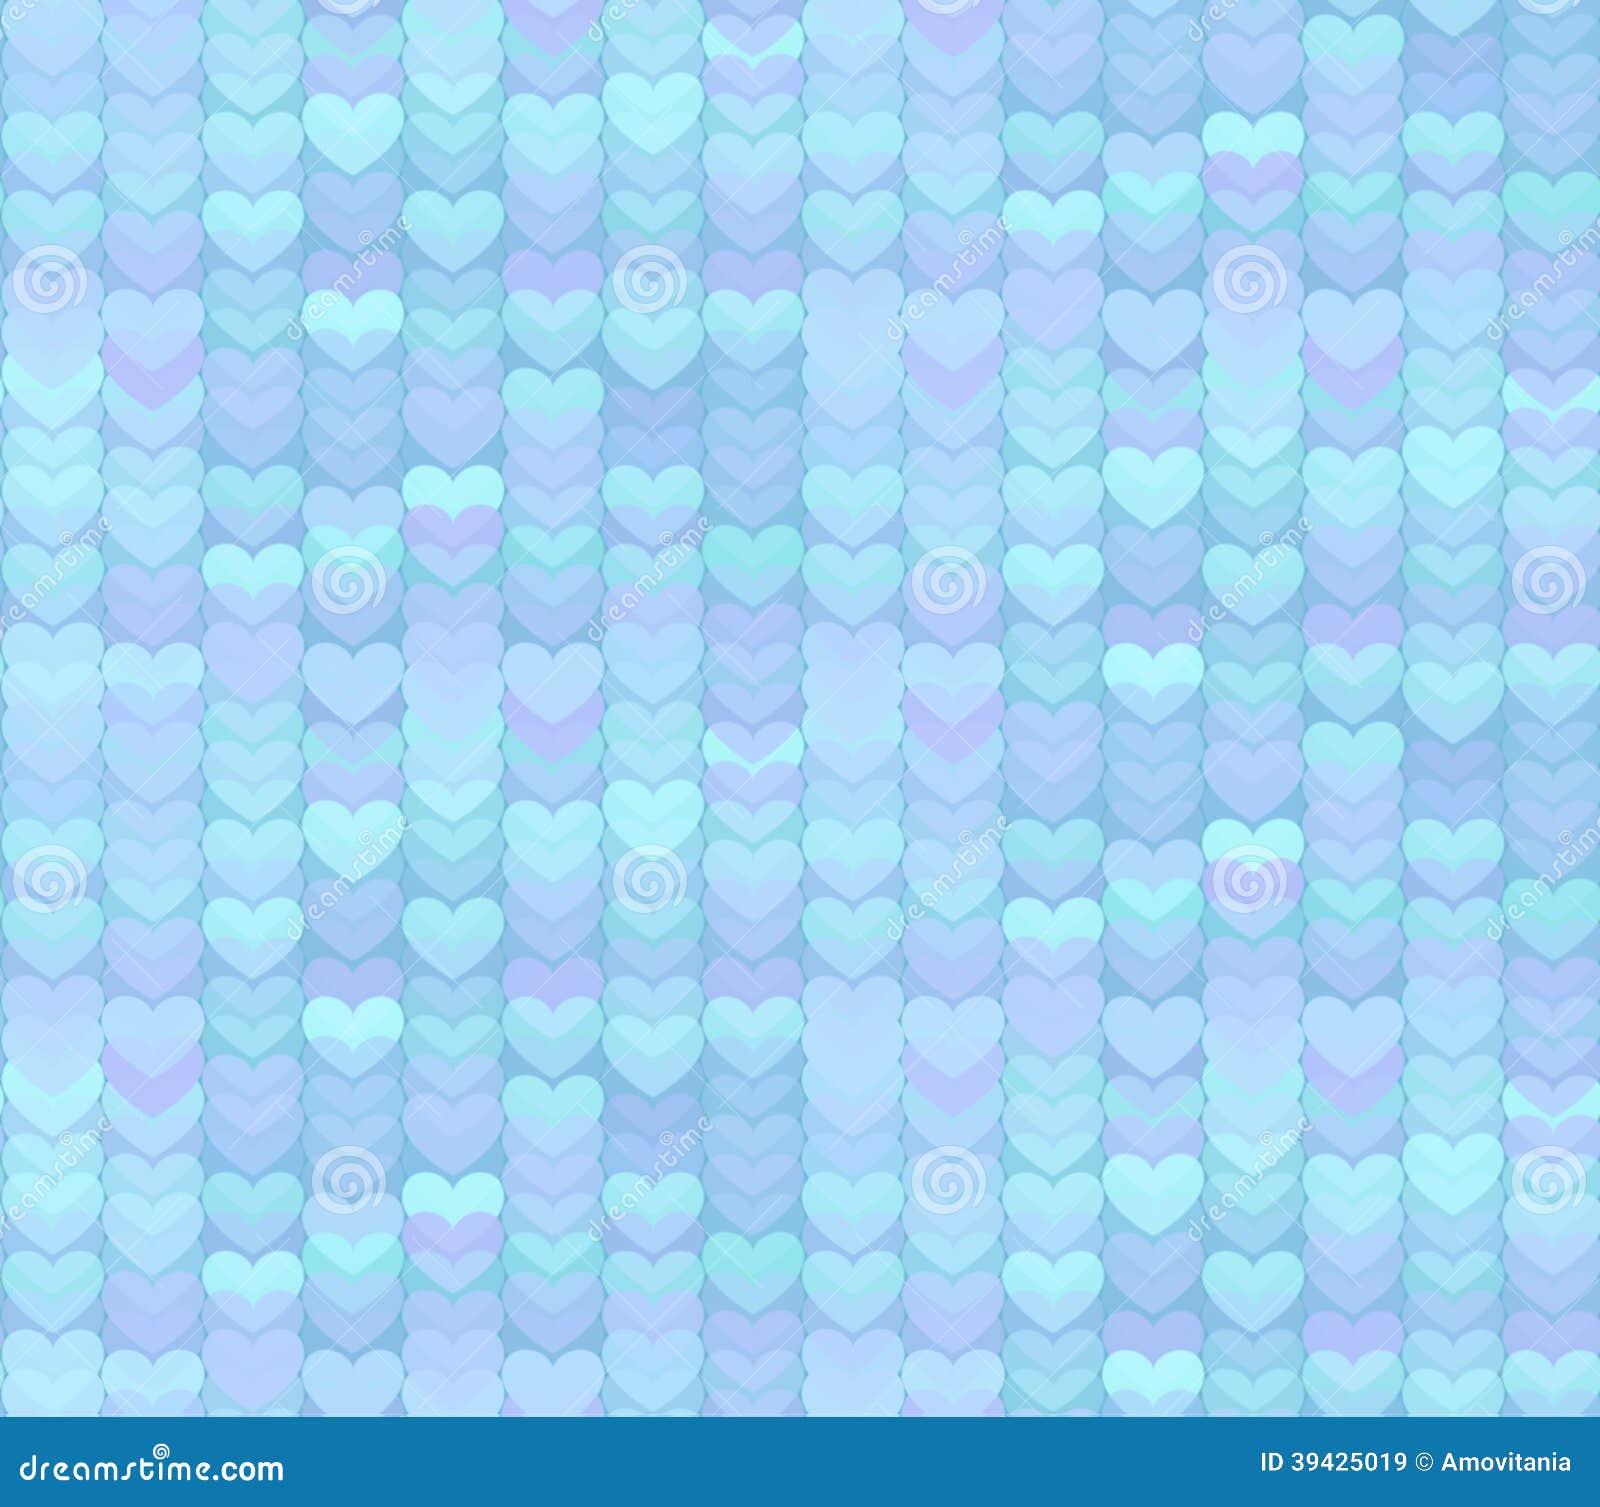 light blue heart background - photo #15